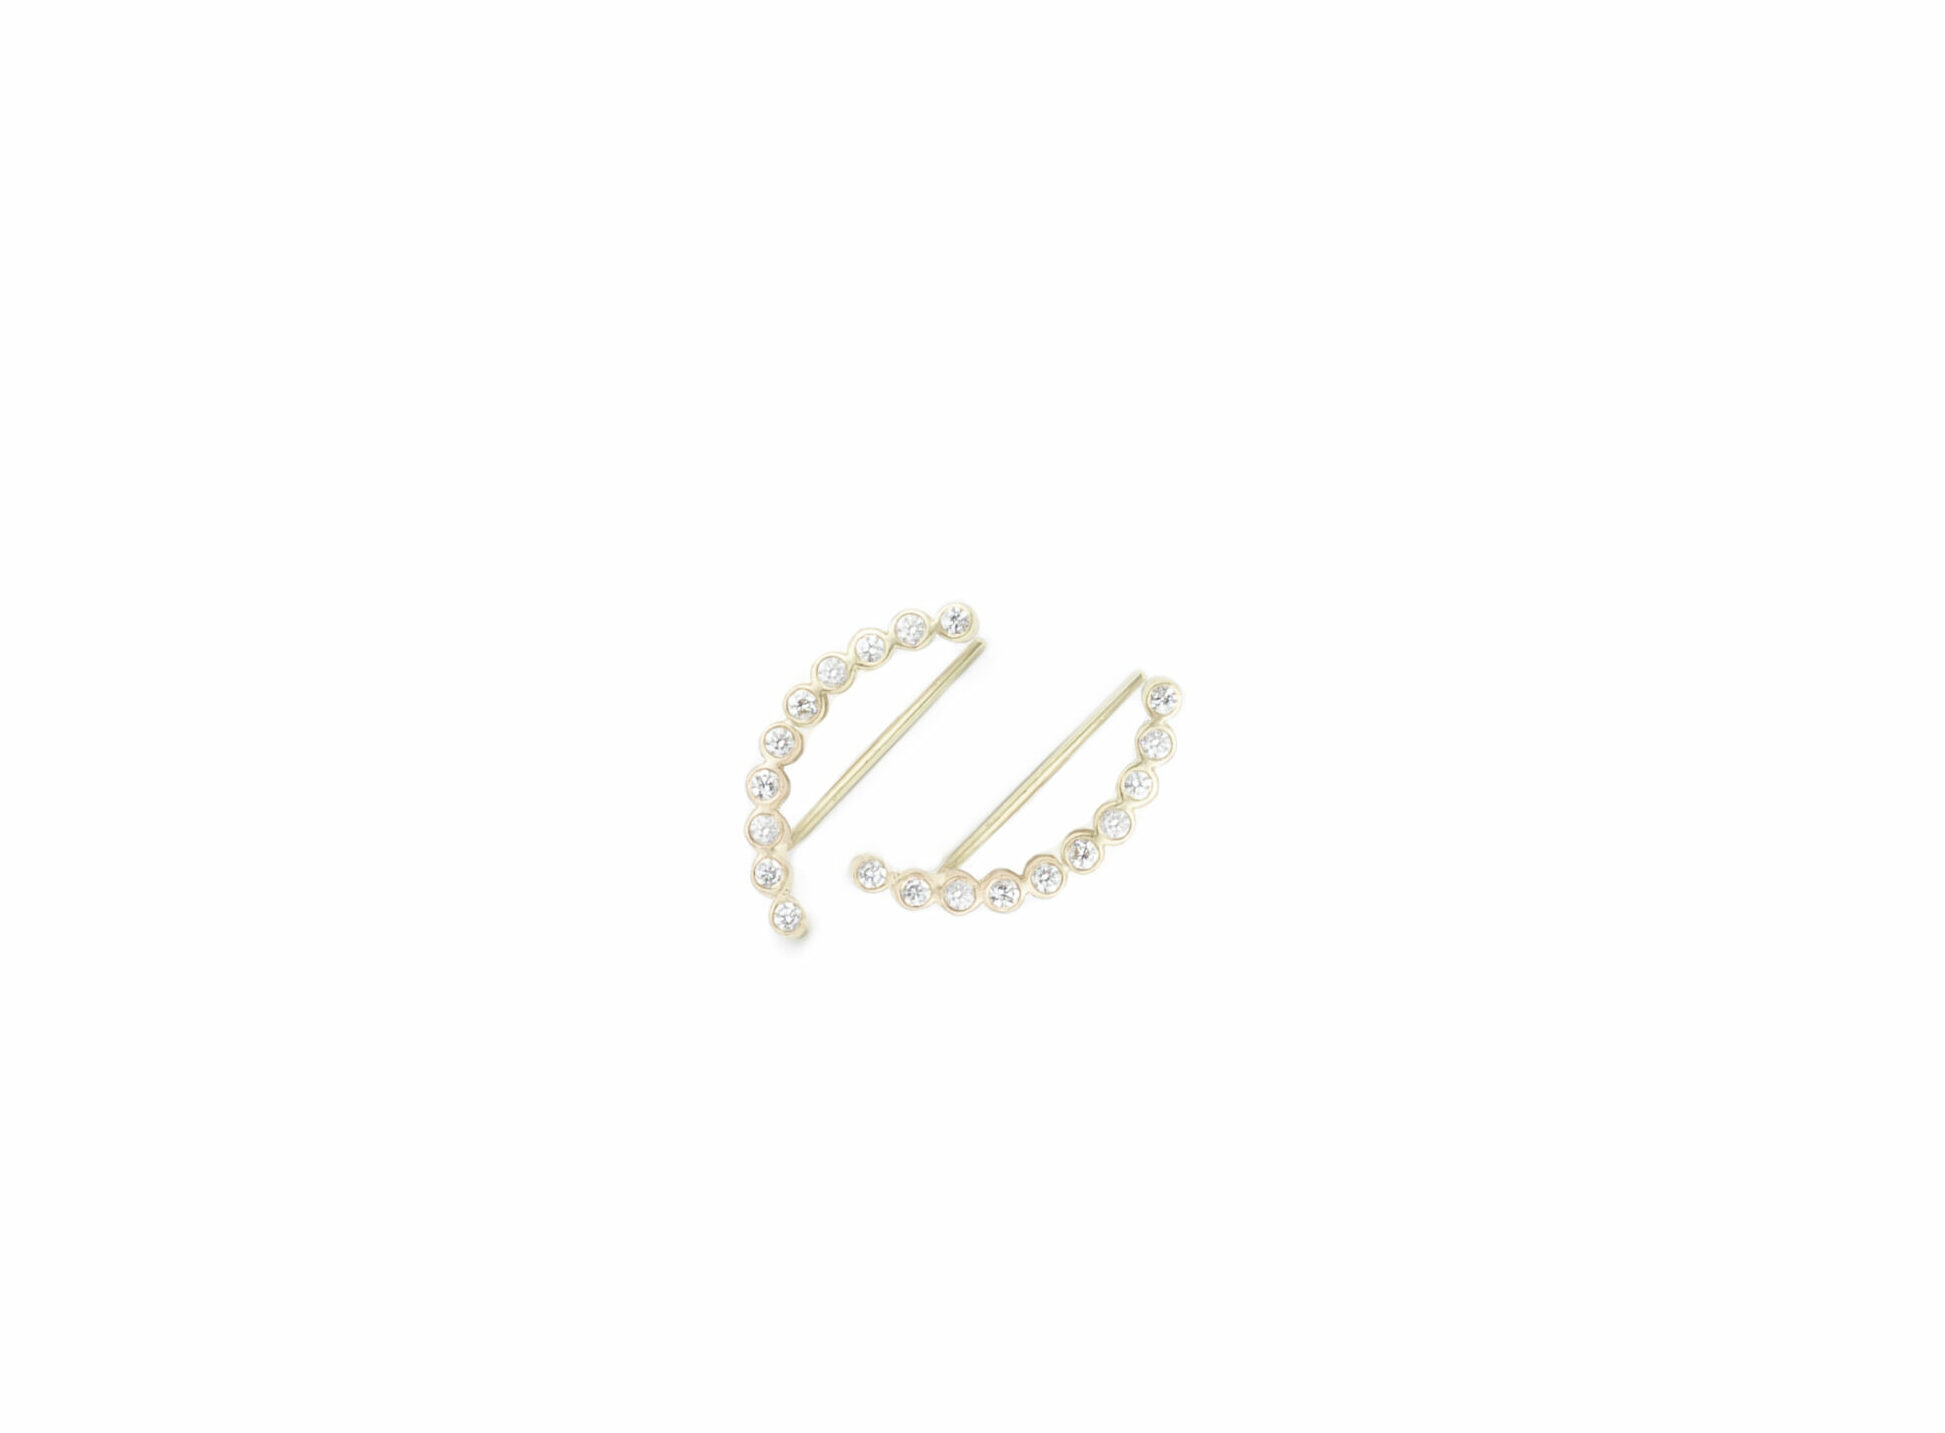 Brinco Ear Cuff – Lado Único